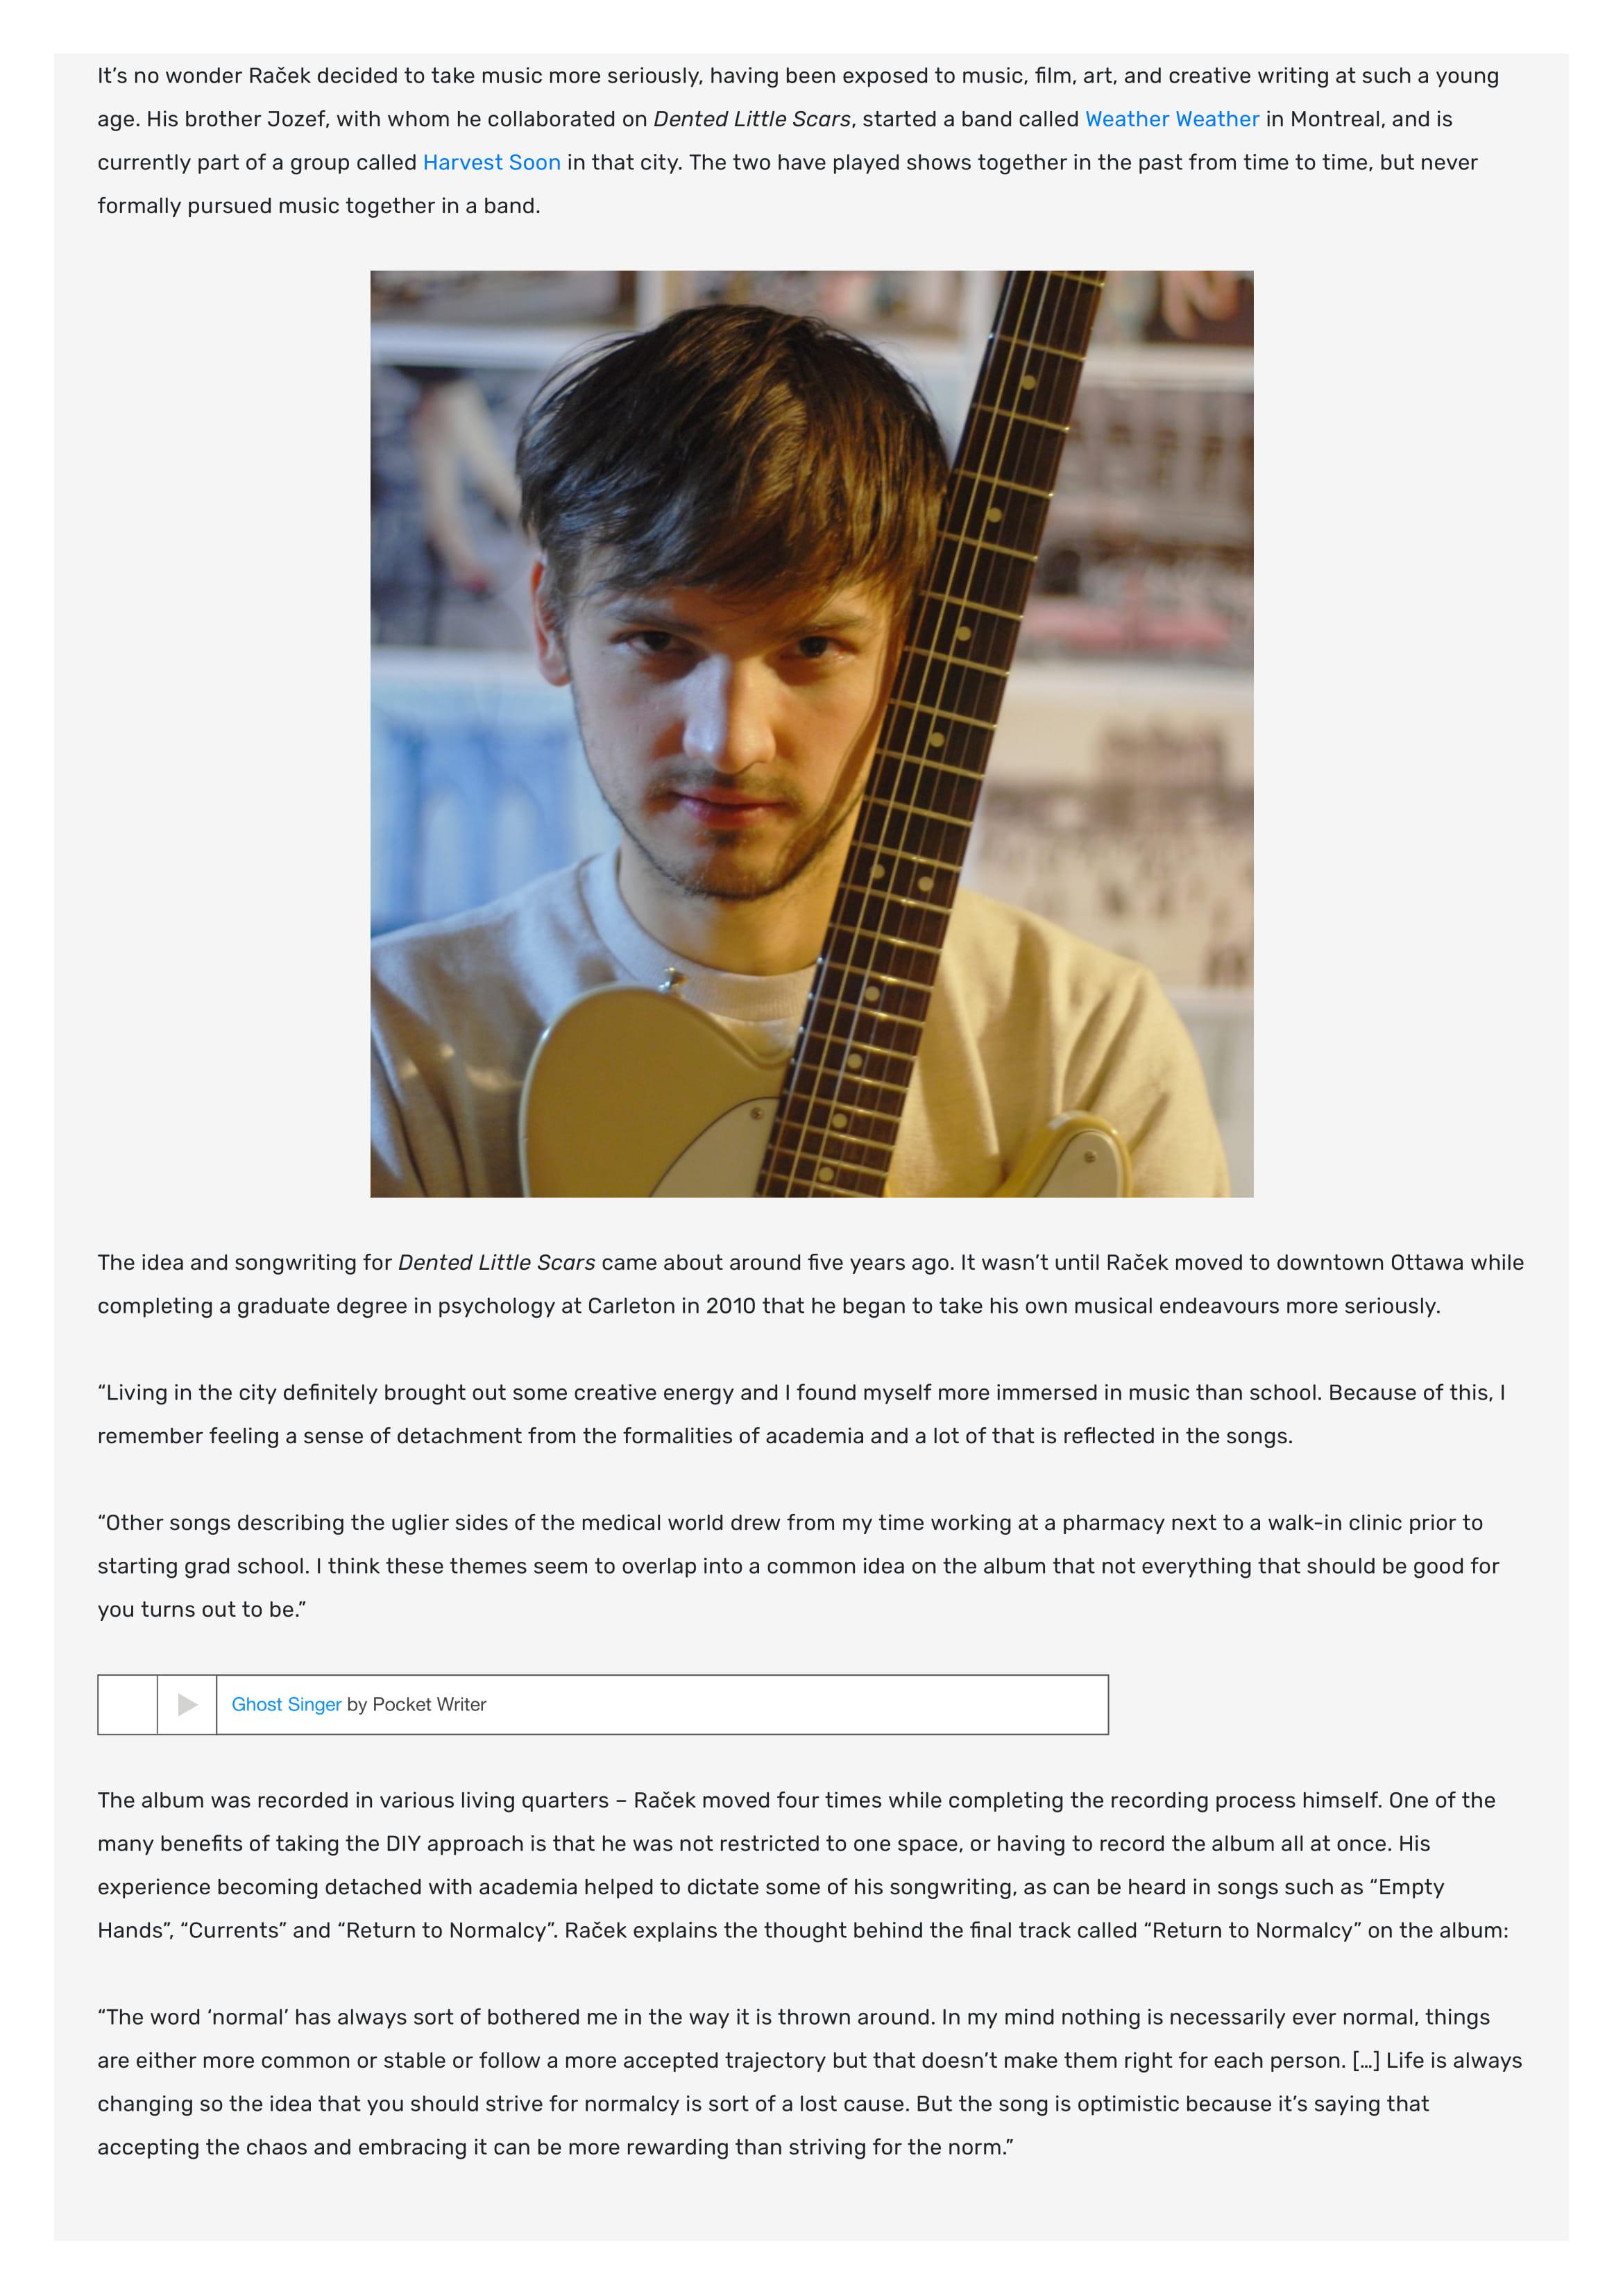 Pocket Writer New Music Ottawa Showbox-2.jpg